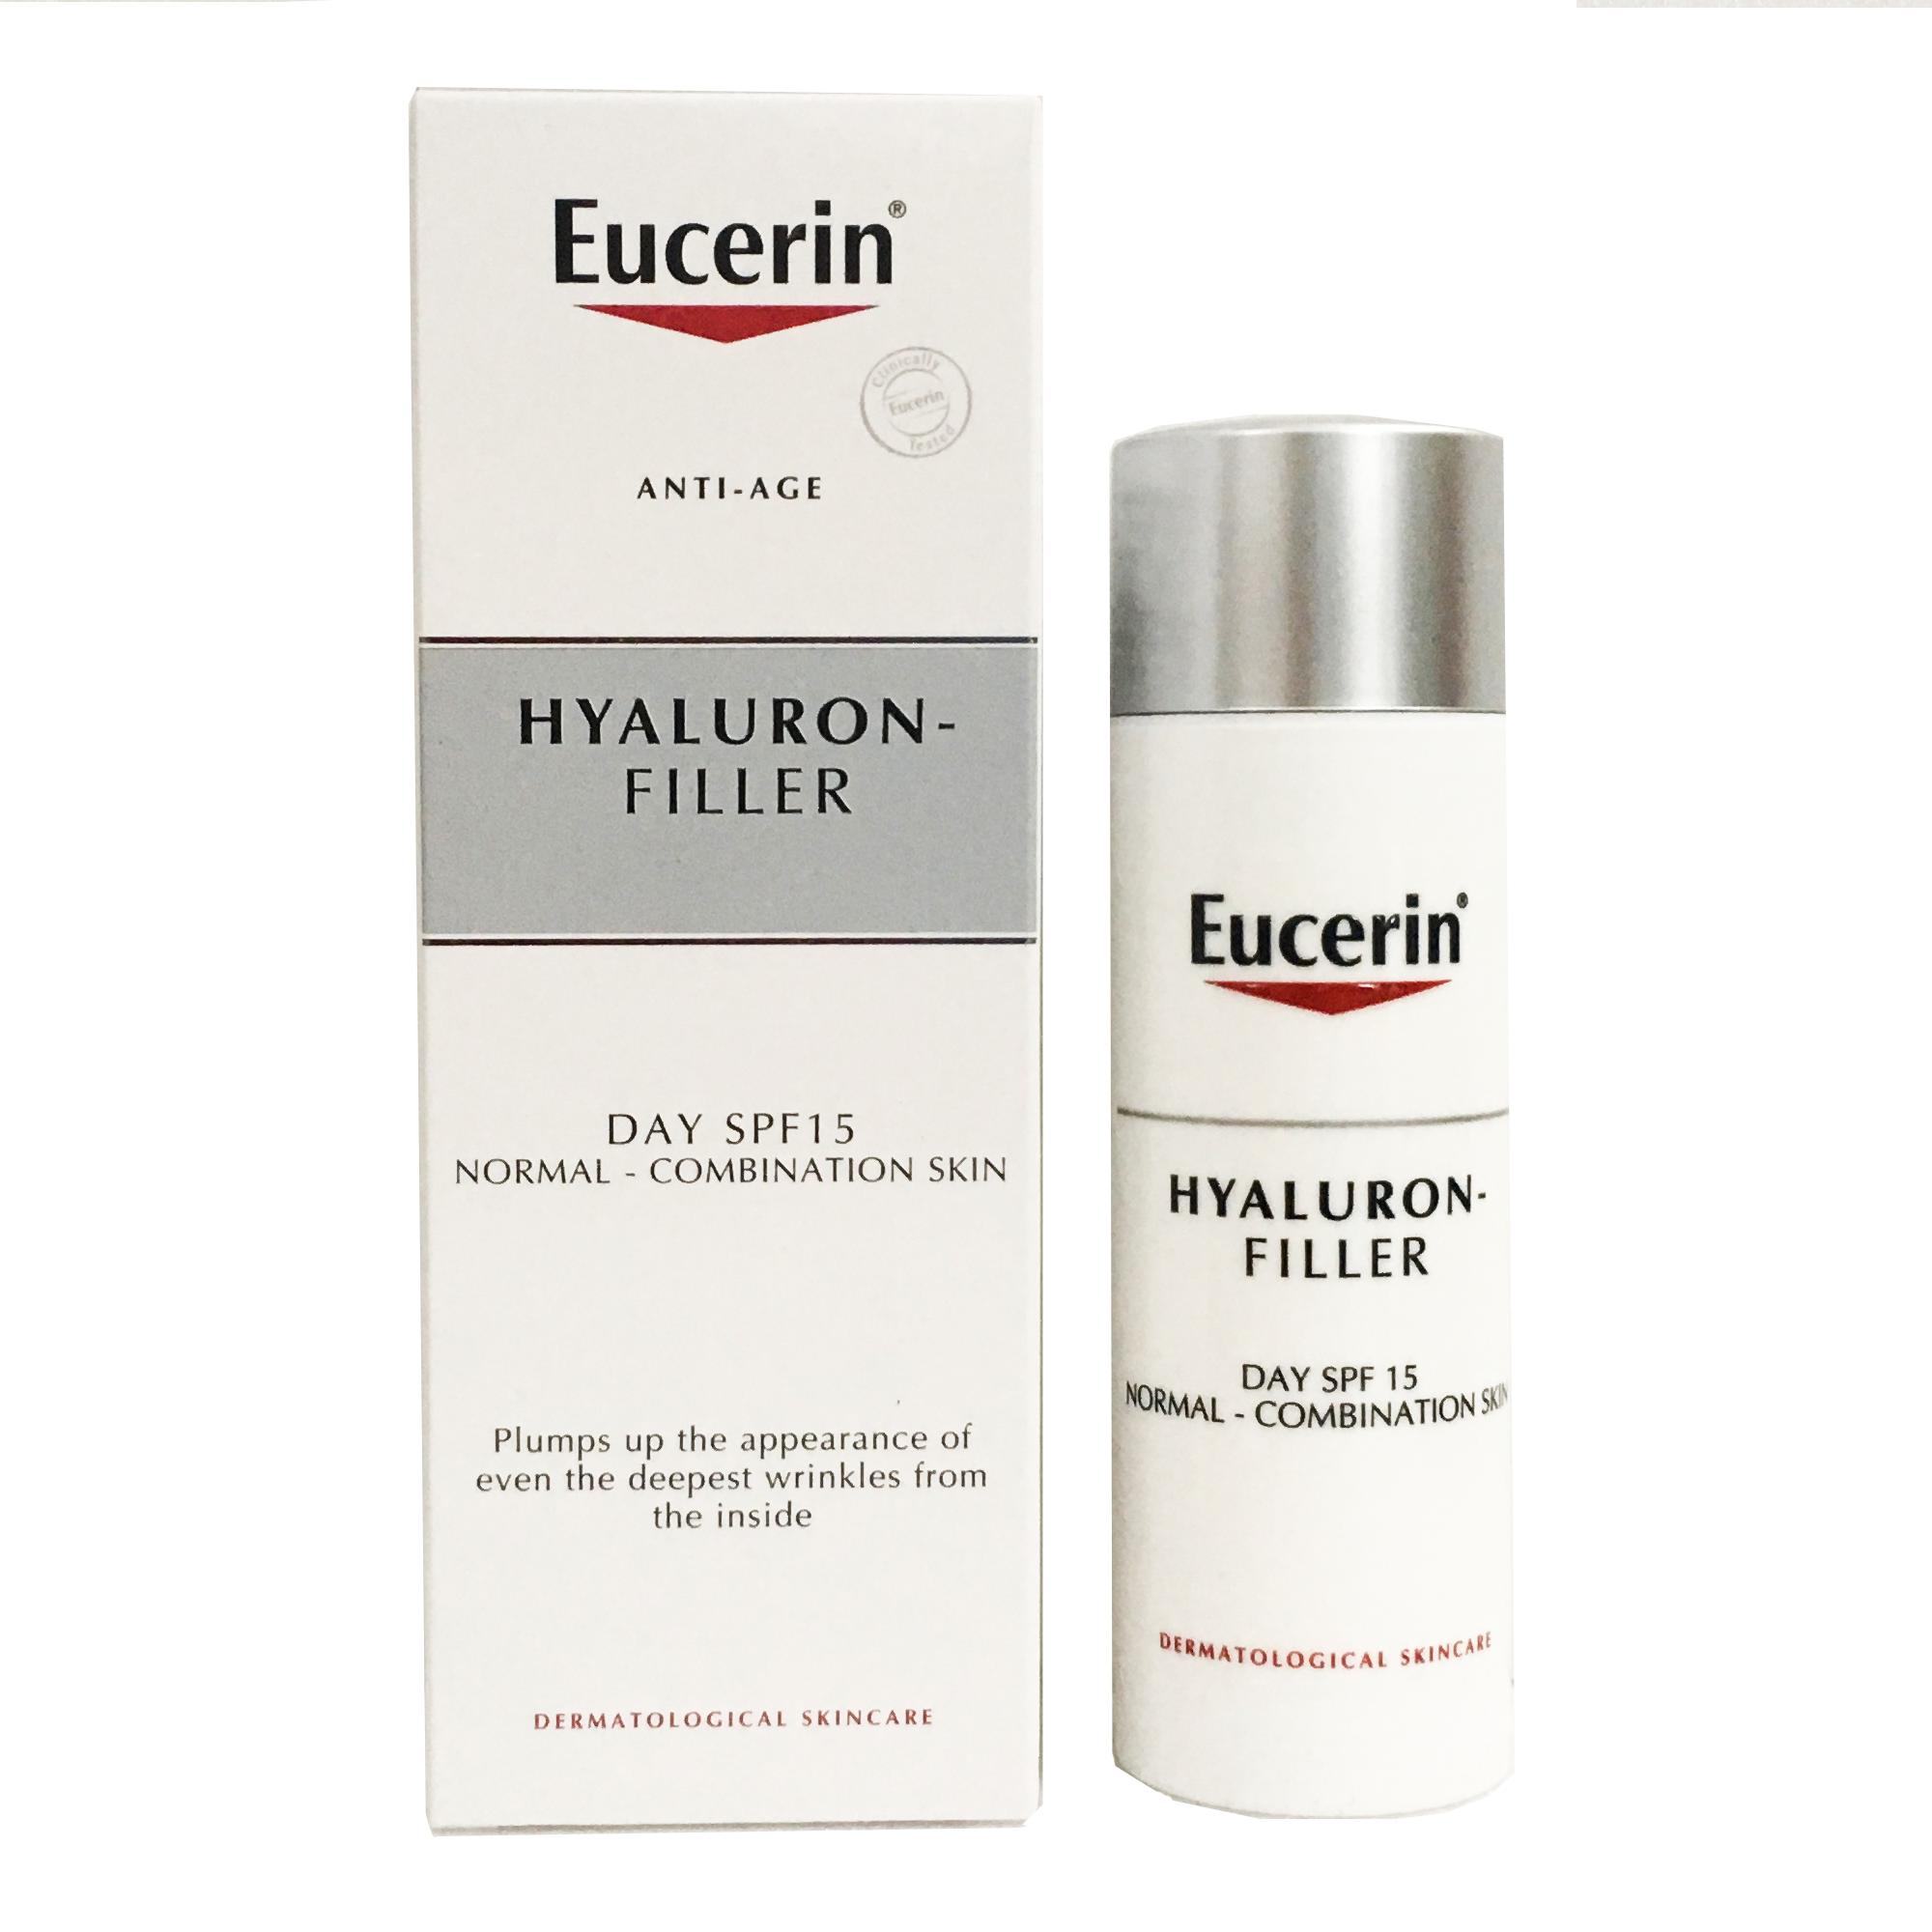 Eucerin Hyaluron-Filler Day SPF15 Anti-Age ยูเซอริน ไฮยารูรอนฟิลเลอร์ ผสมกันแดด 50ml.